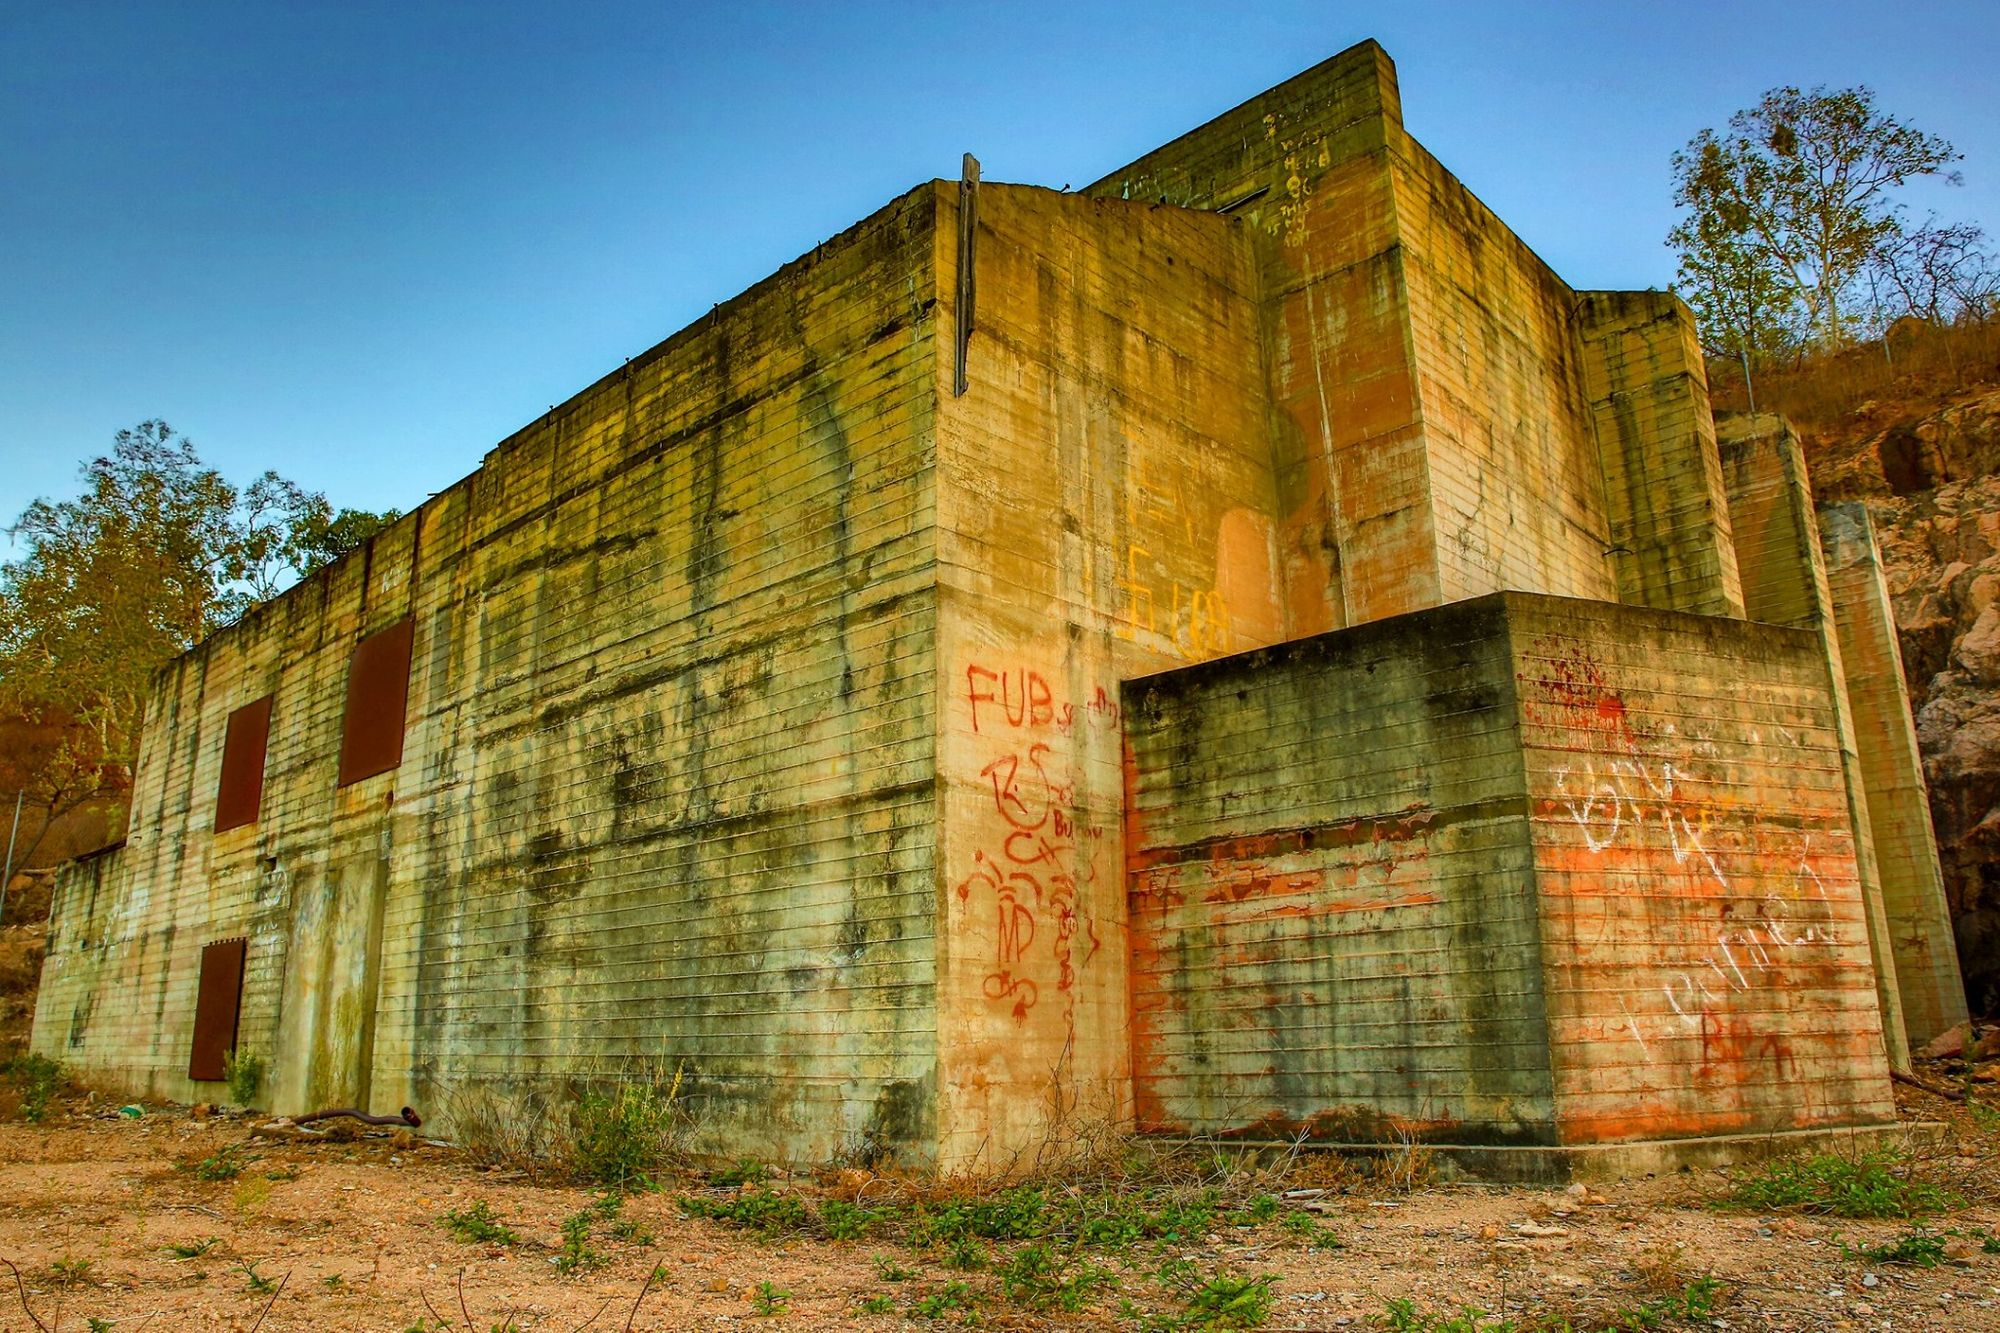 stuart headquaters bunker